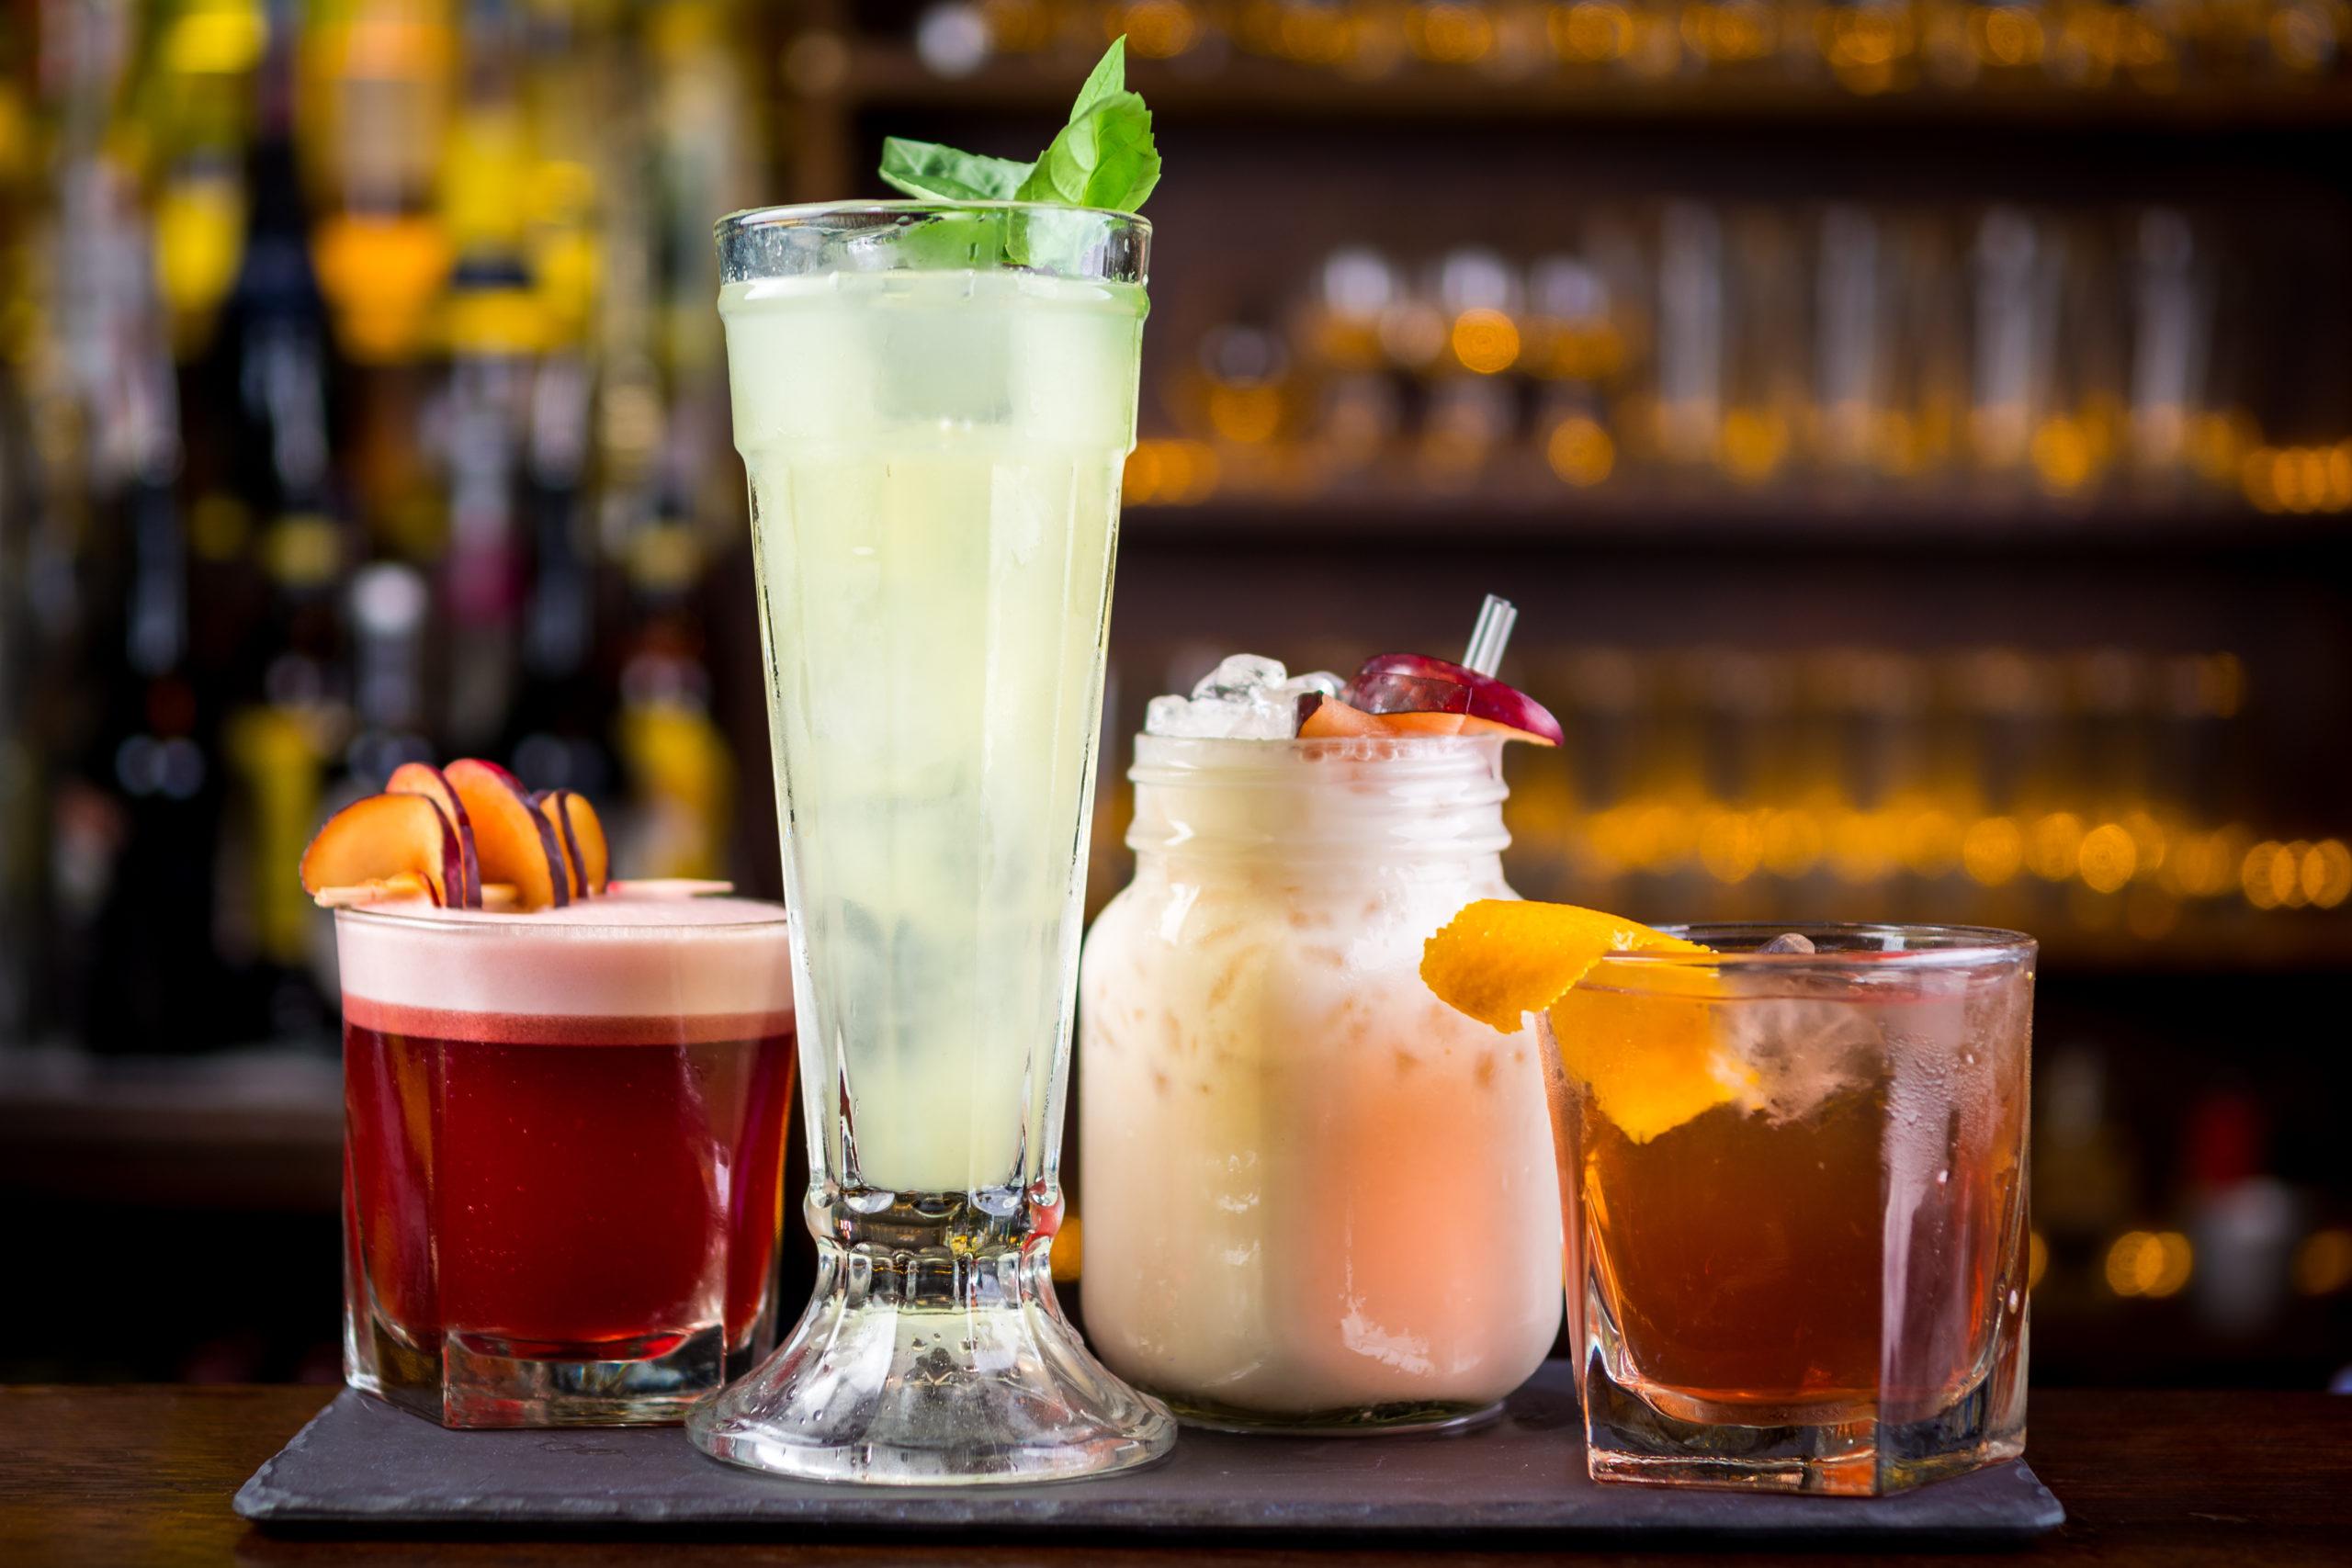 Sober bars: los bares sin alcohol que los millennials aman